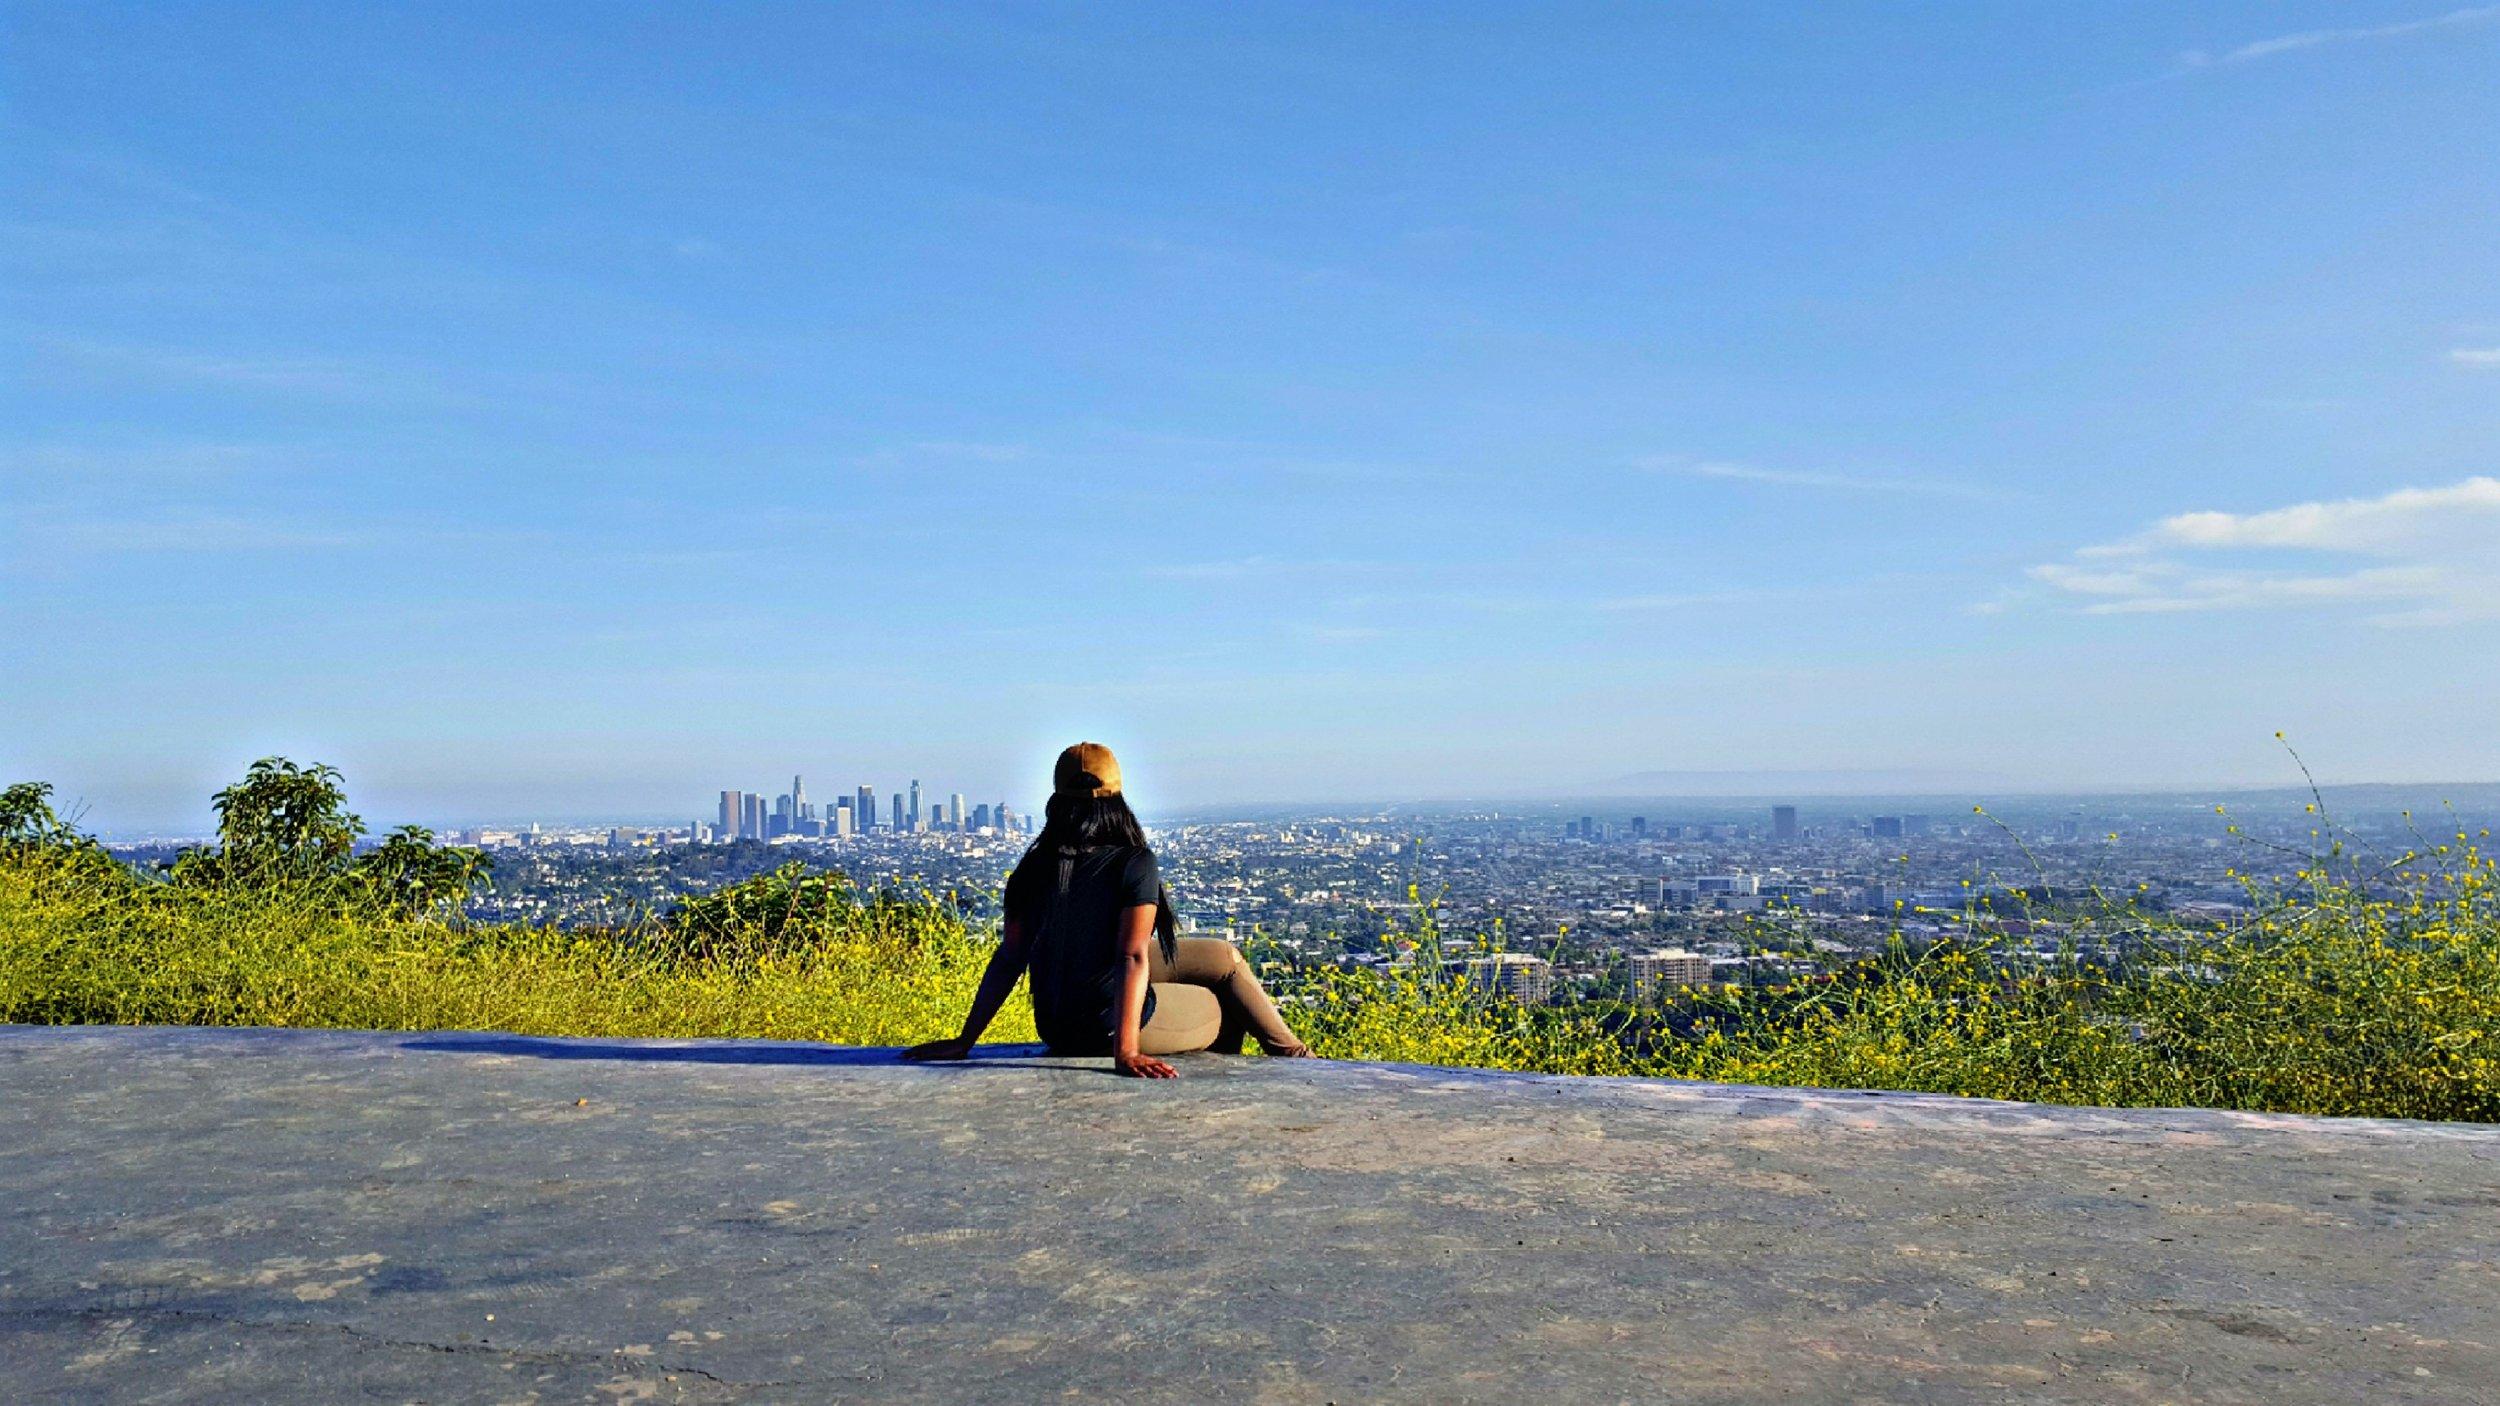 Griffith Park Helipad, Los Angeles CA